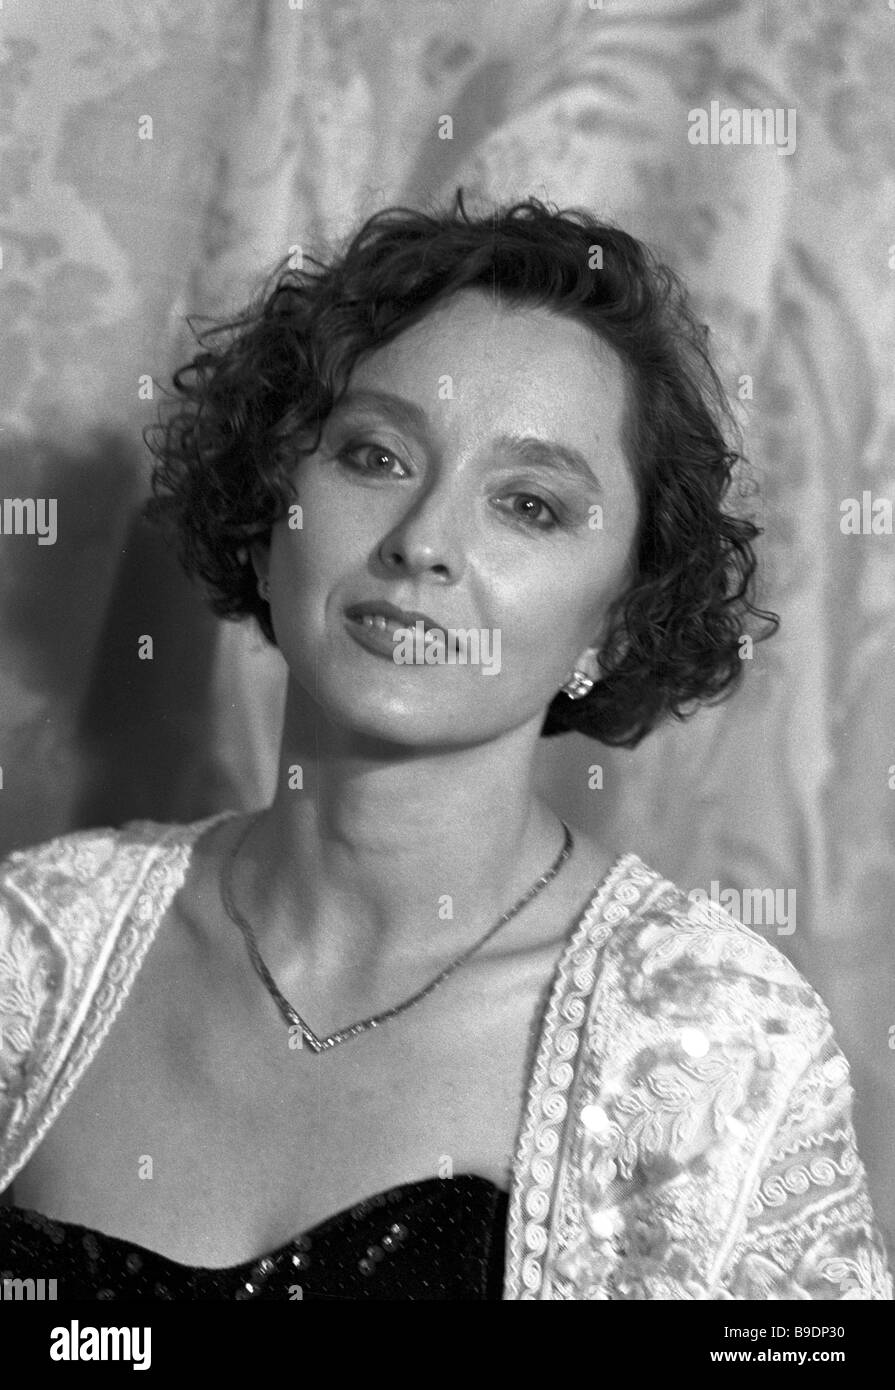 Biography of Anastasia Vertinskaya - Ophelia of theatrical art